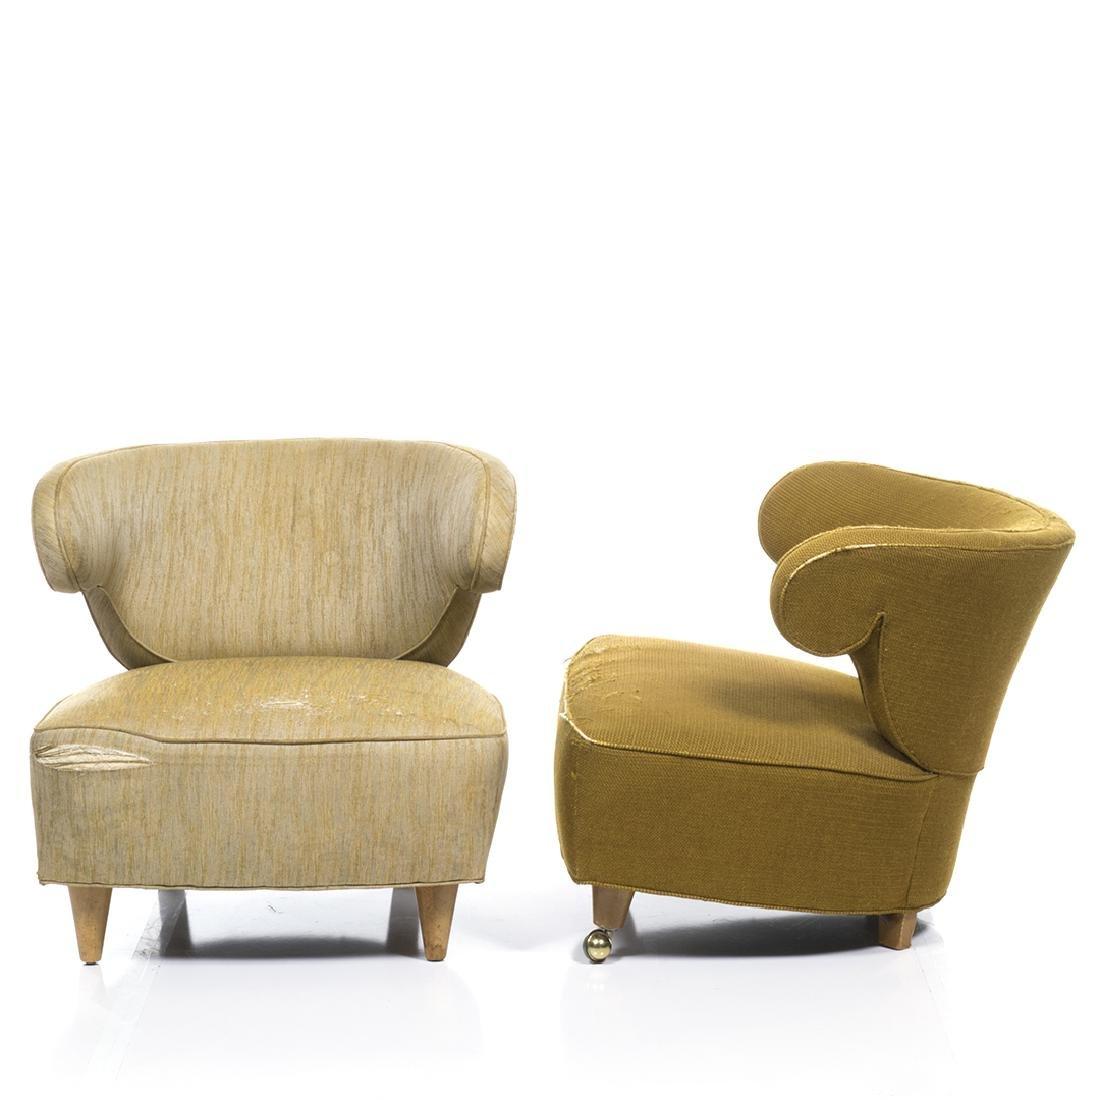 Paul Laszlo Scroll Arm Lounge Chairs (2) - 2